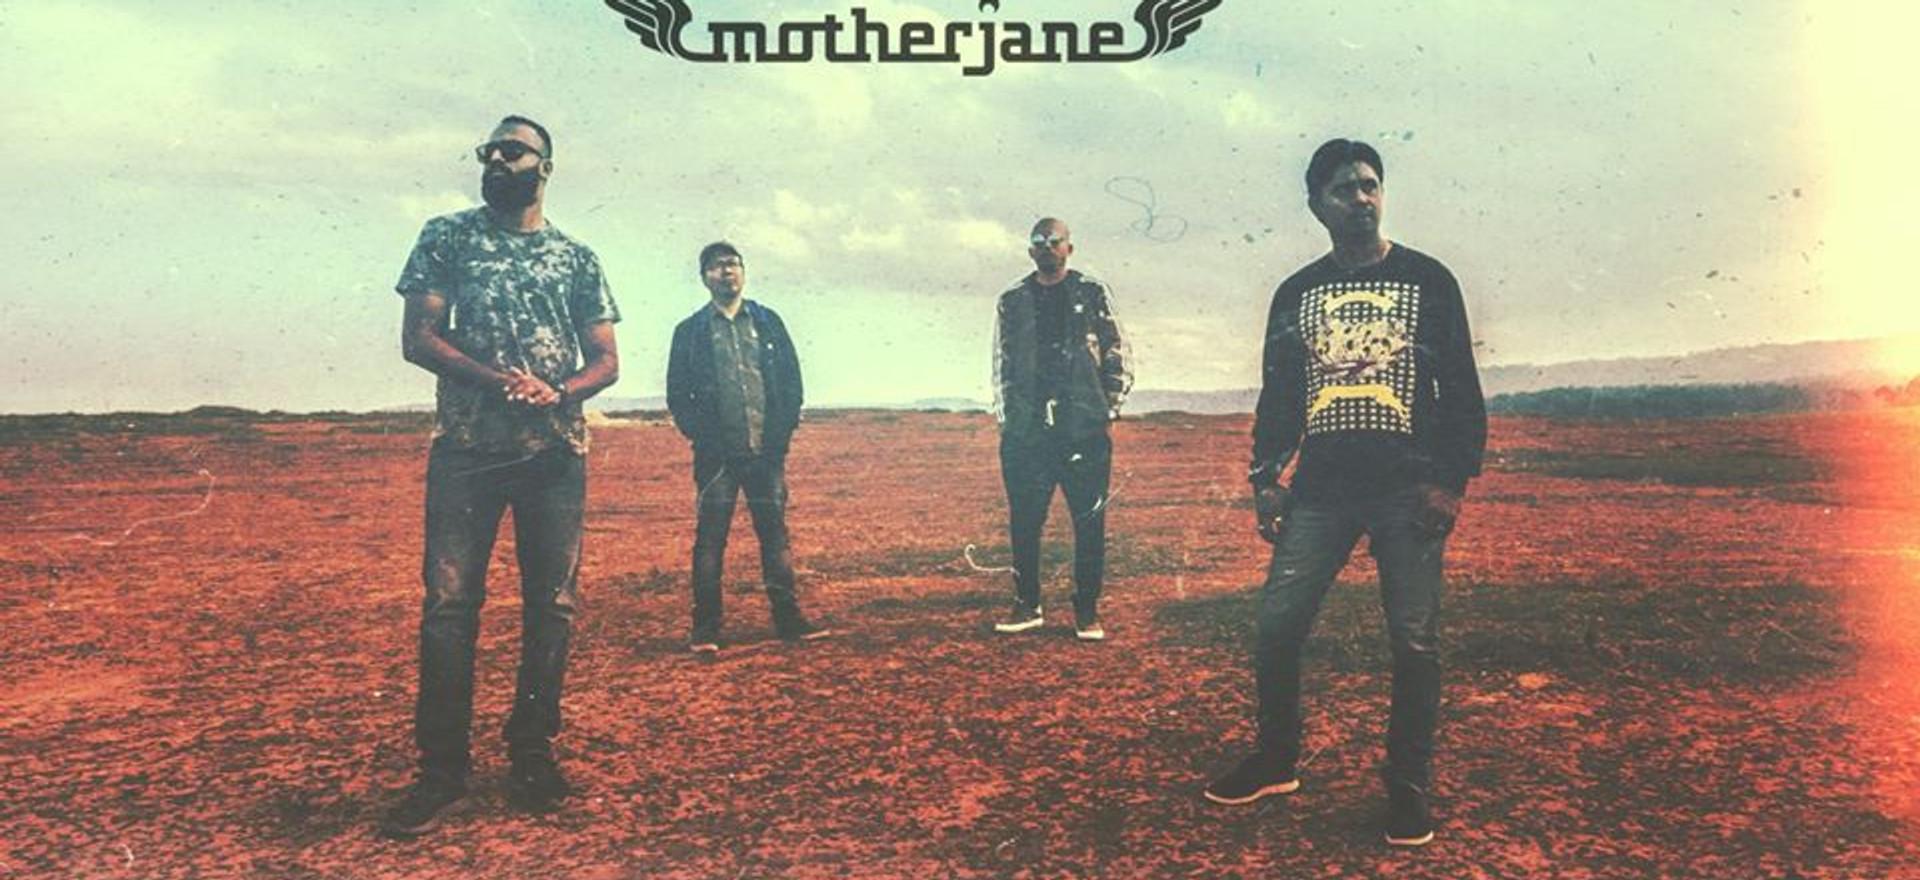 Motherjane - Chasing the sun